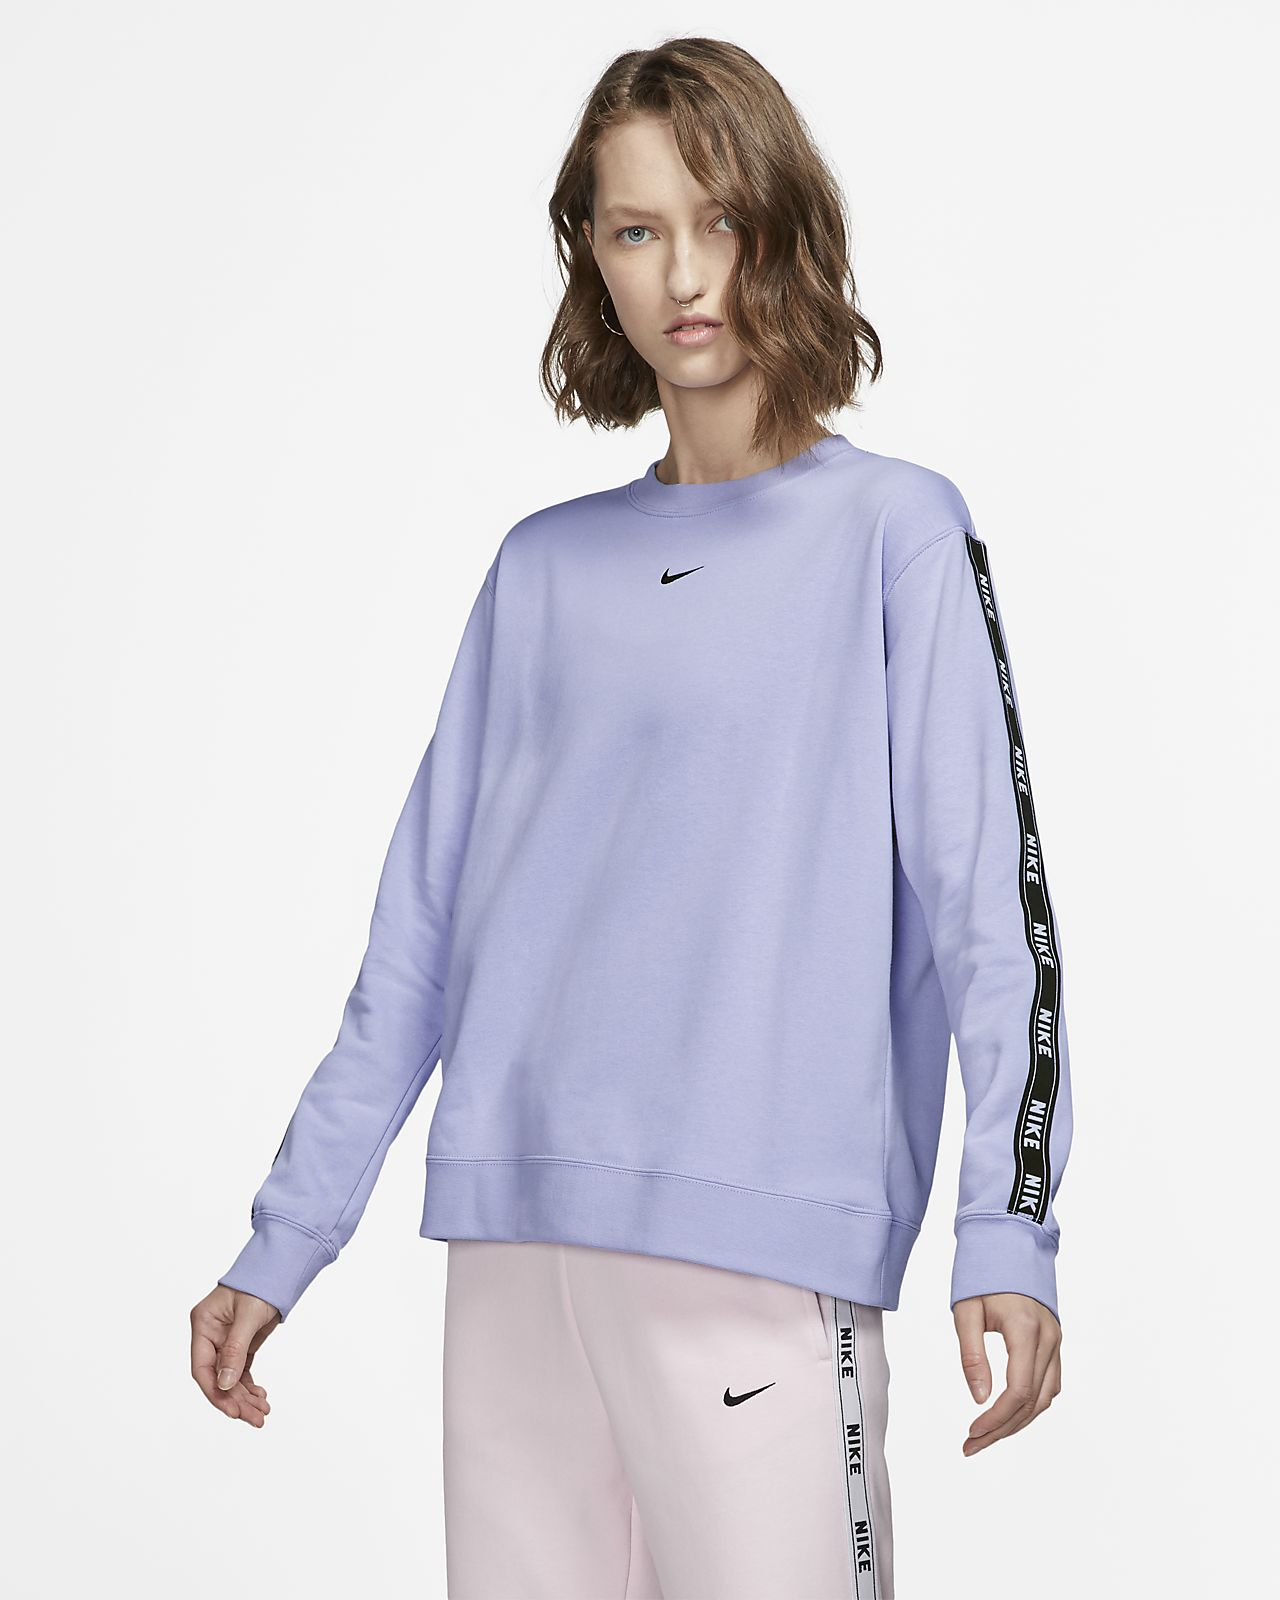 Nike Sportswear Part superior amb logotip